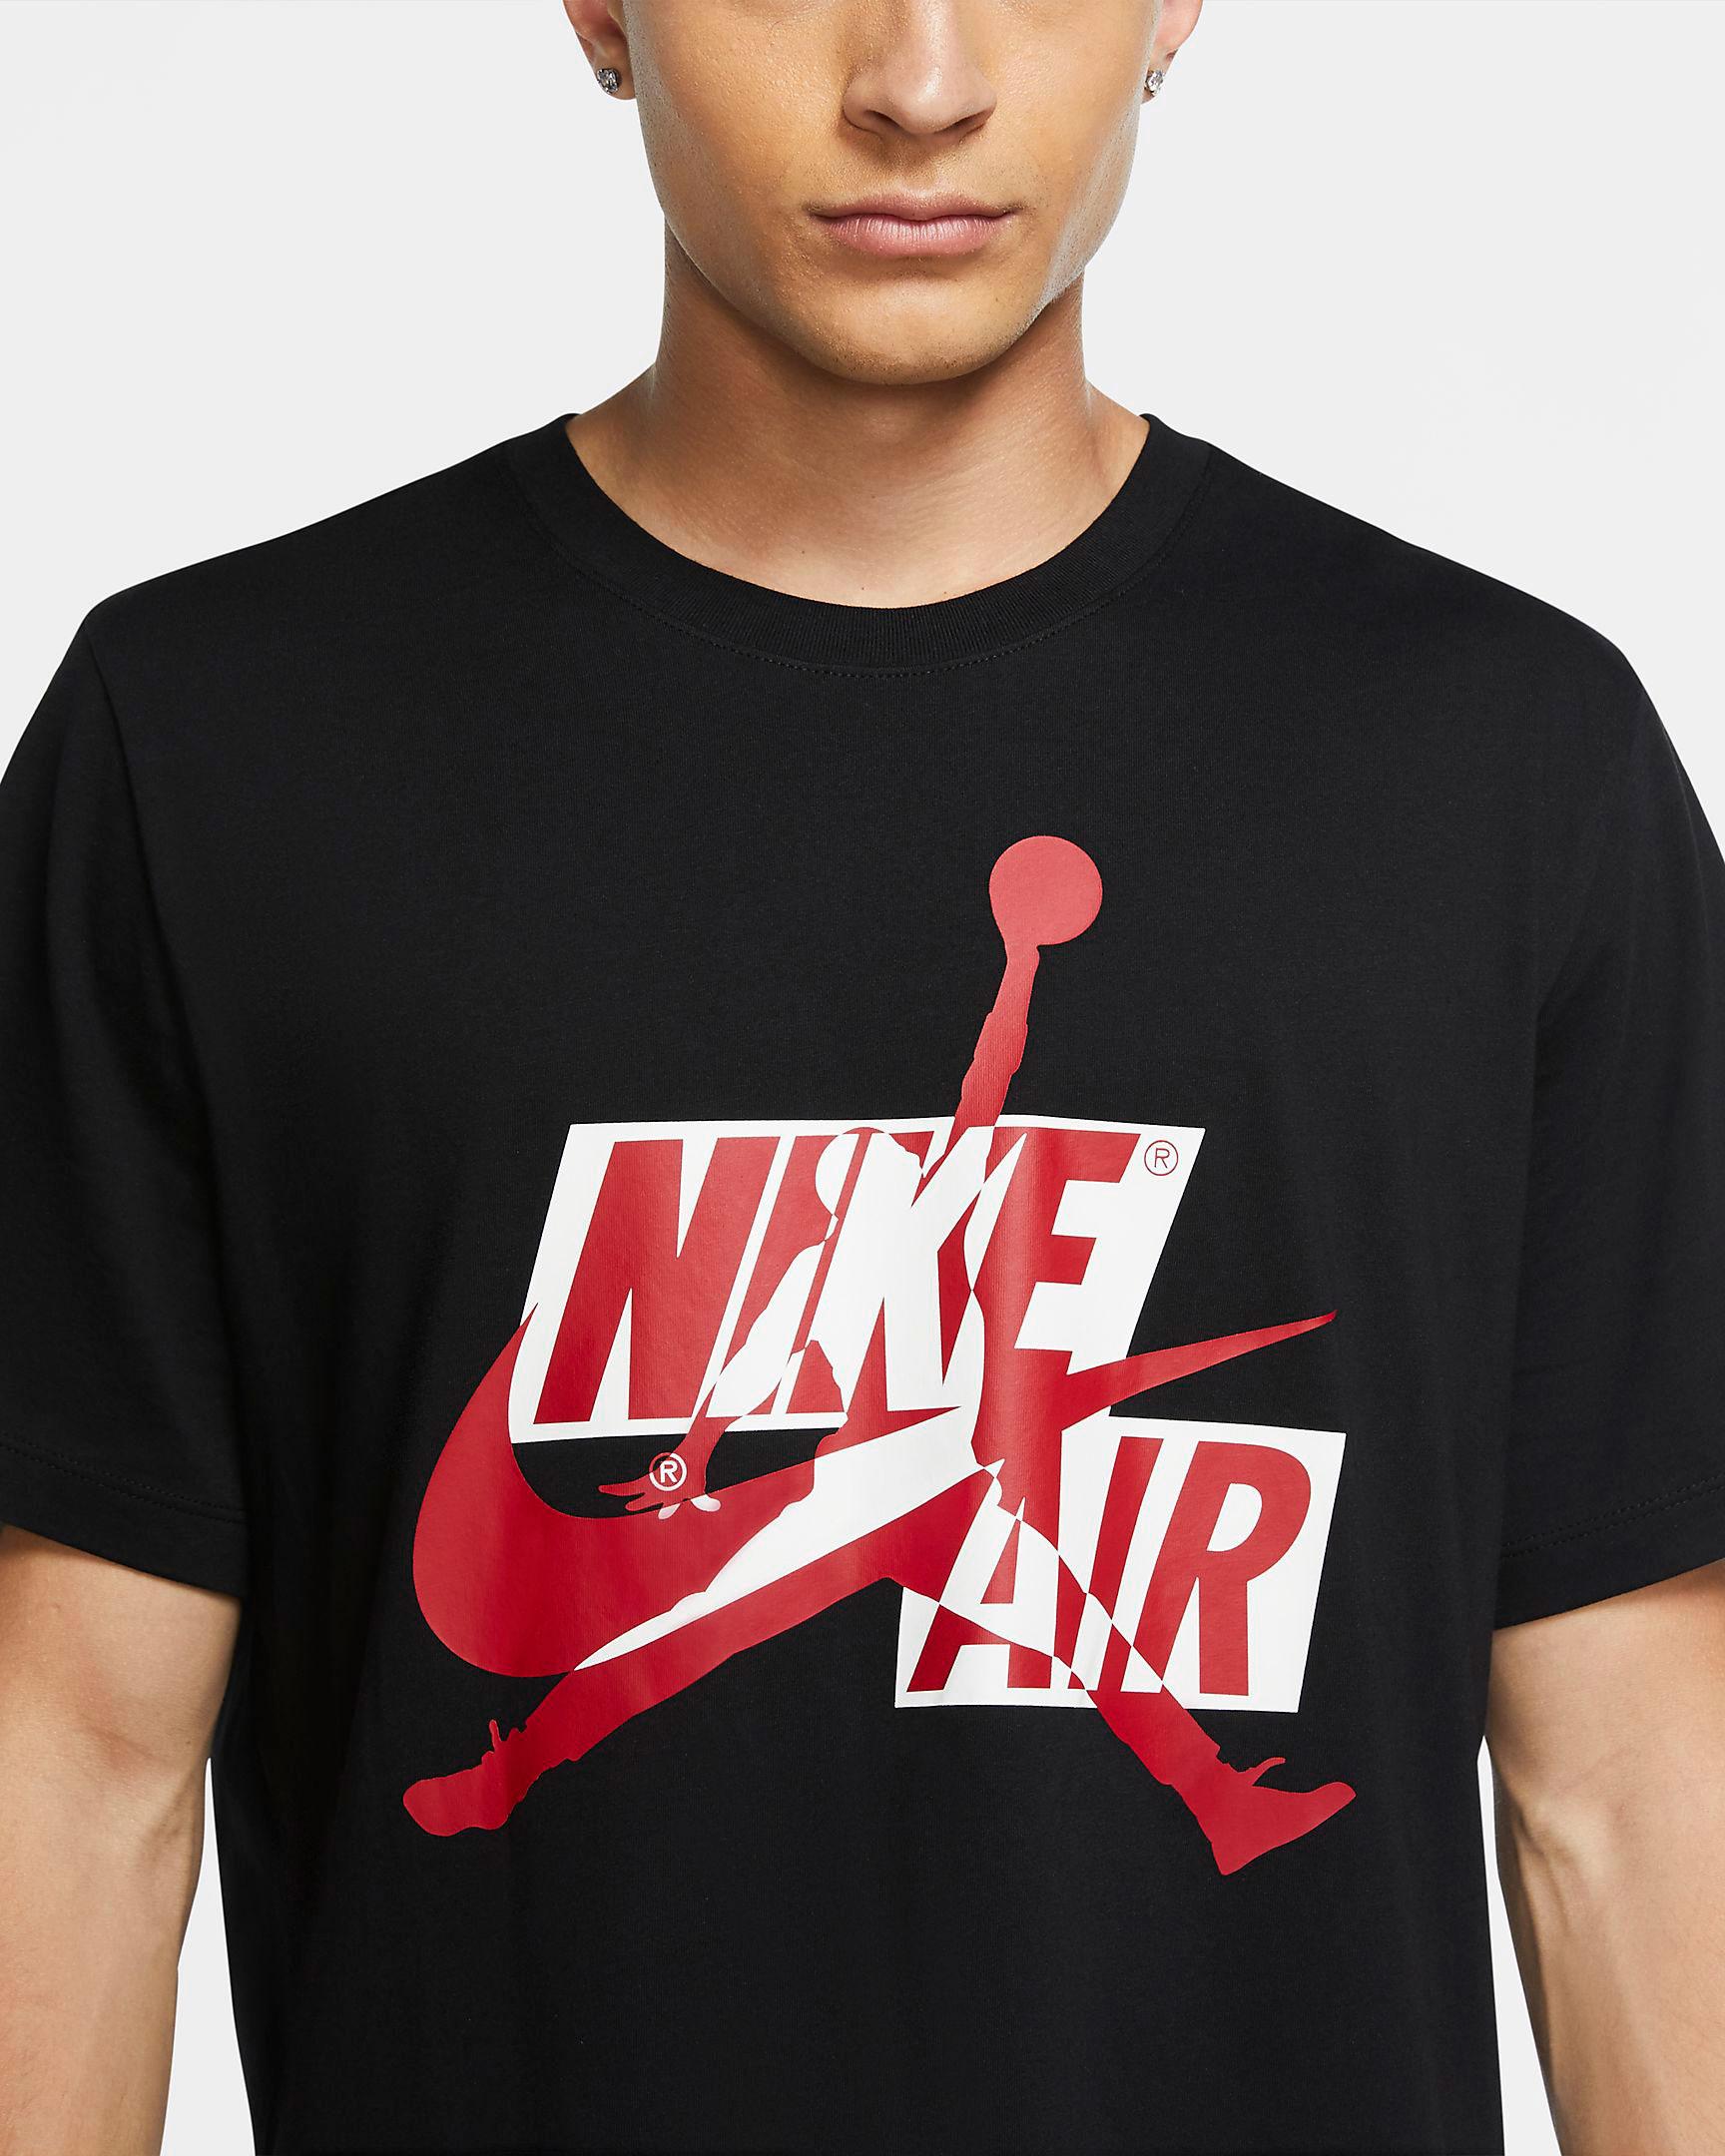 air-jordan-1-mid-banned-shirt